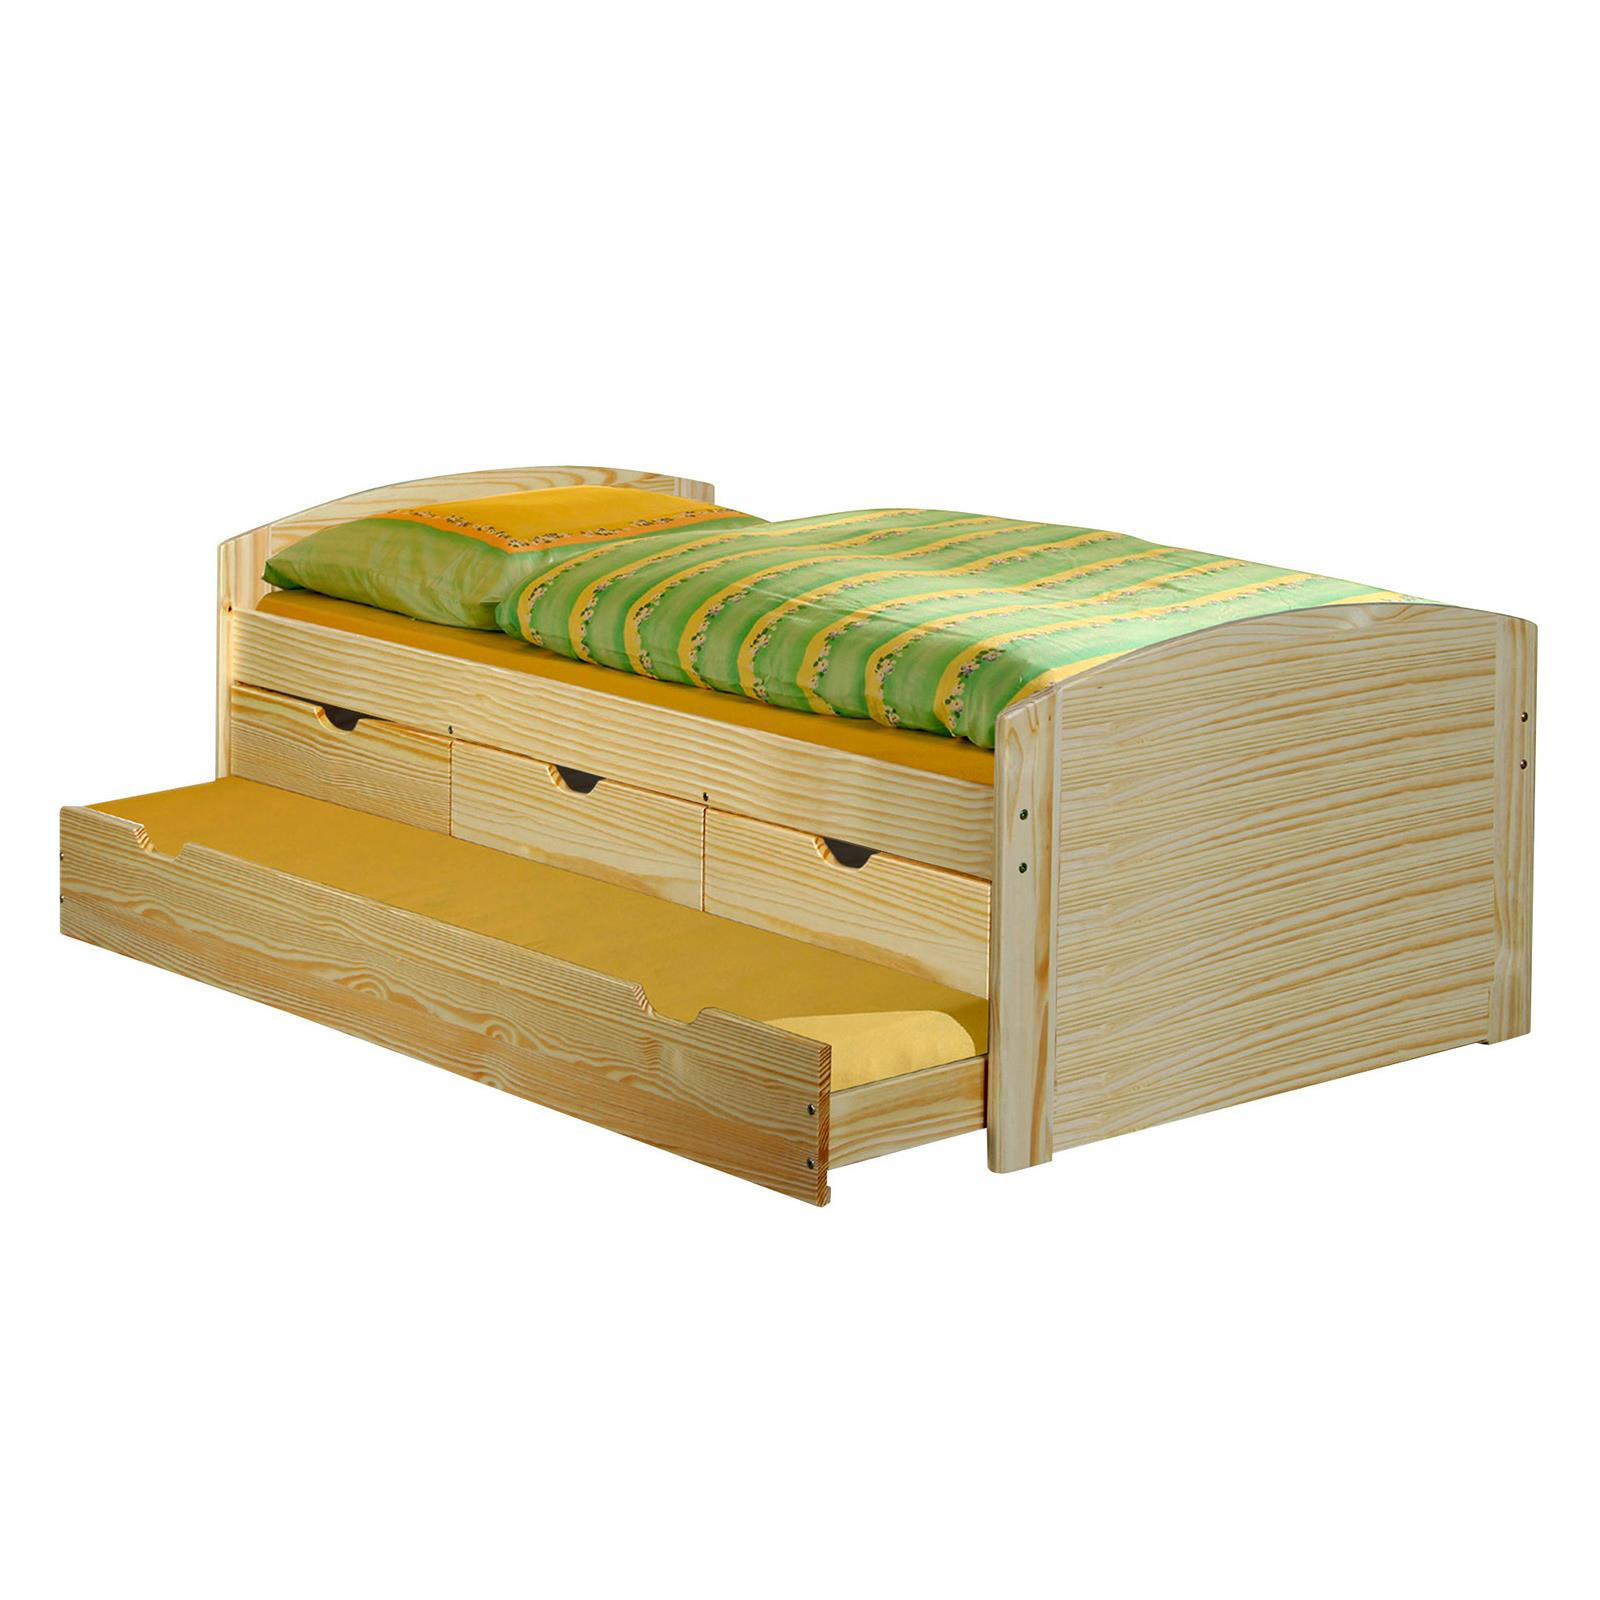 Lit gigogne en pin julia 90 x 200 cm vernis naturel mobil meubles - Lit gigogne 90 x 200 ...